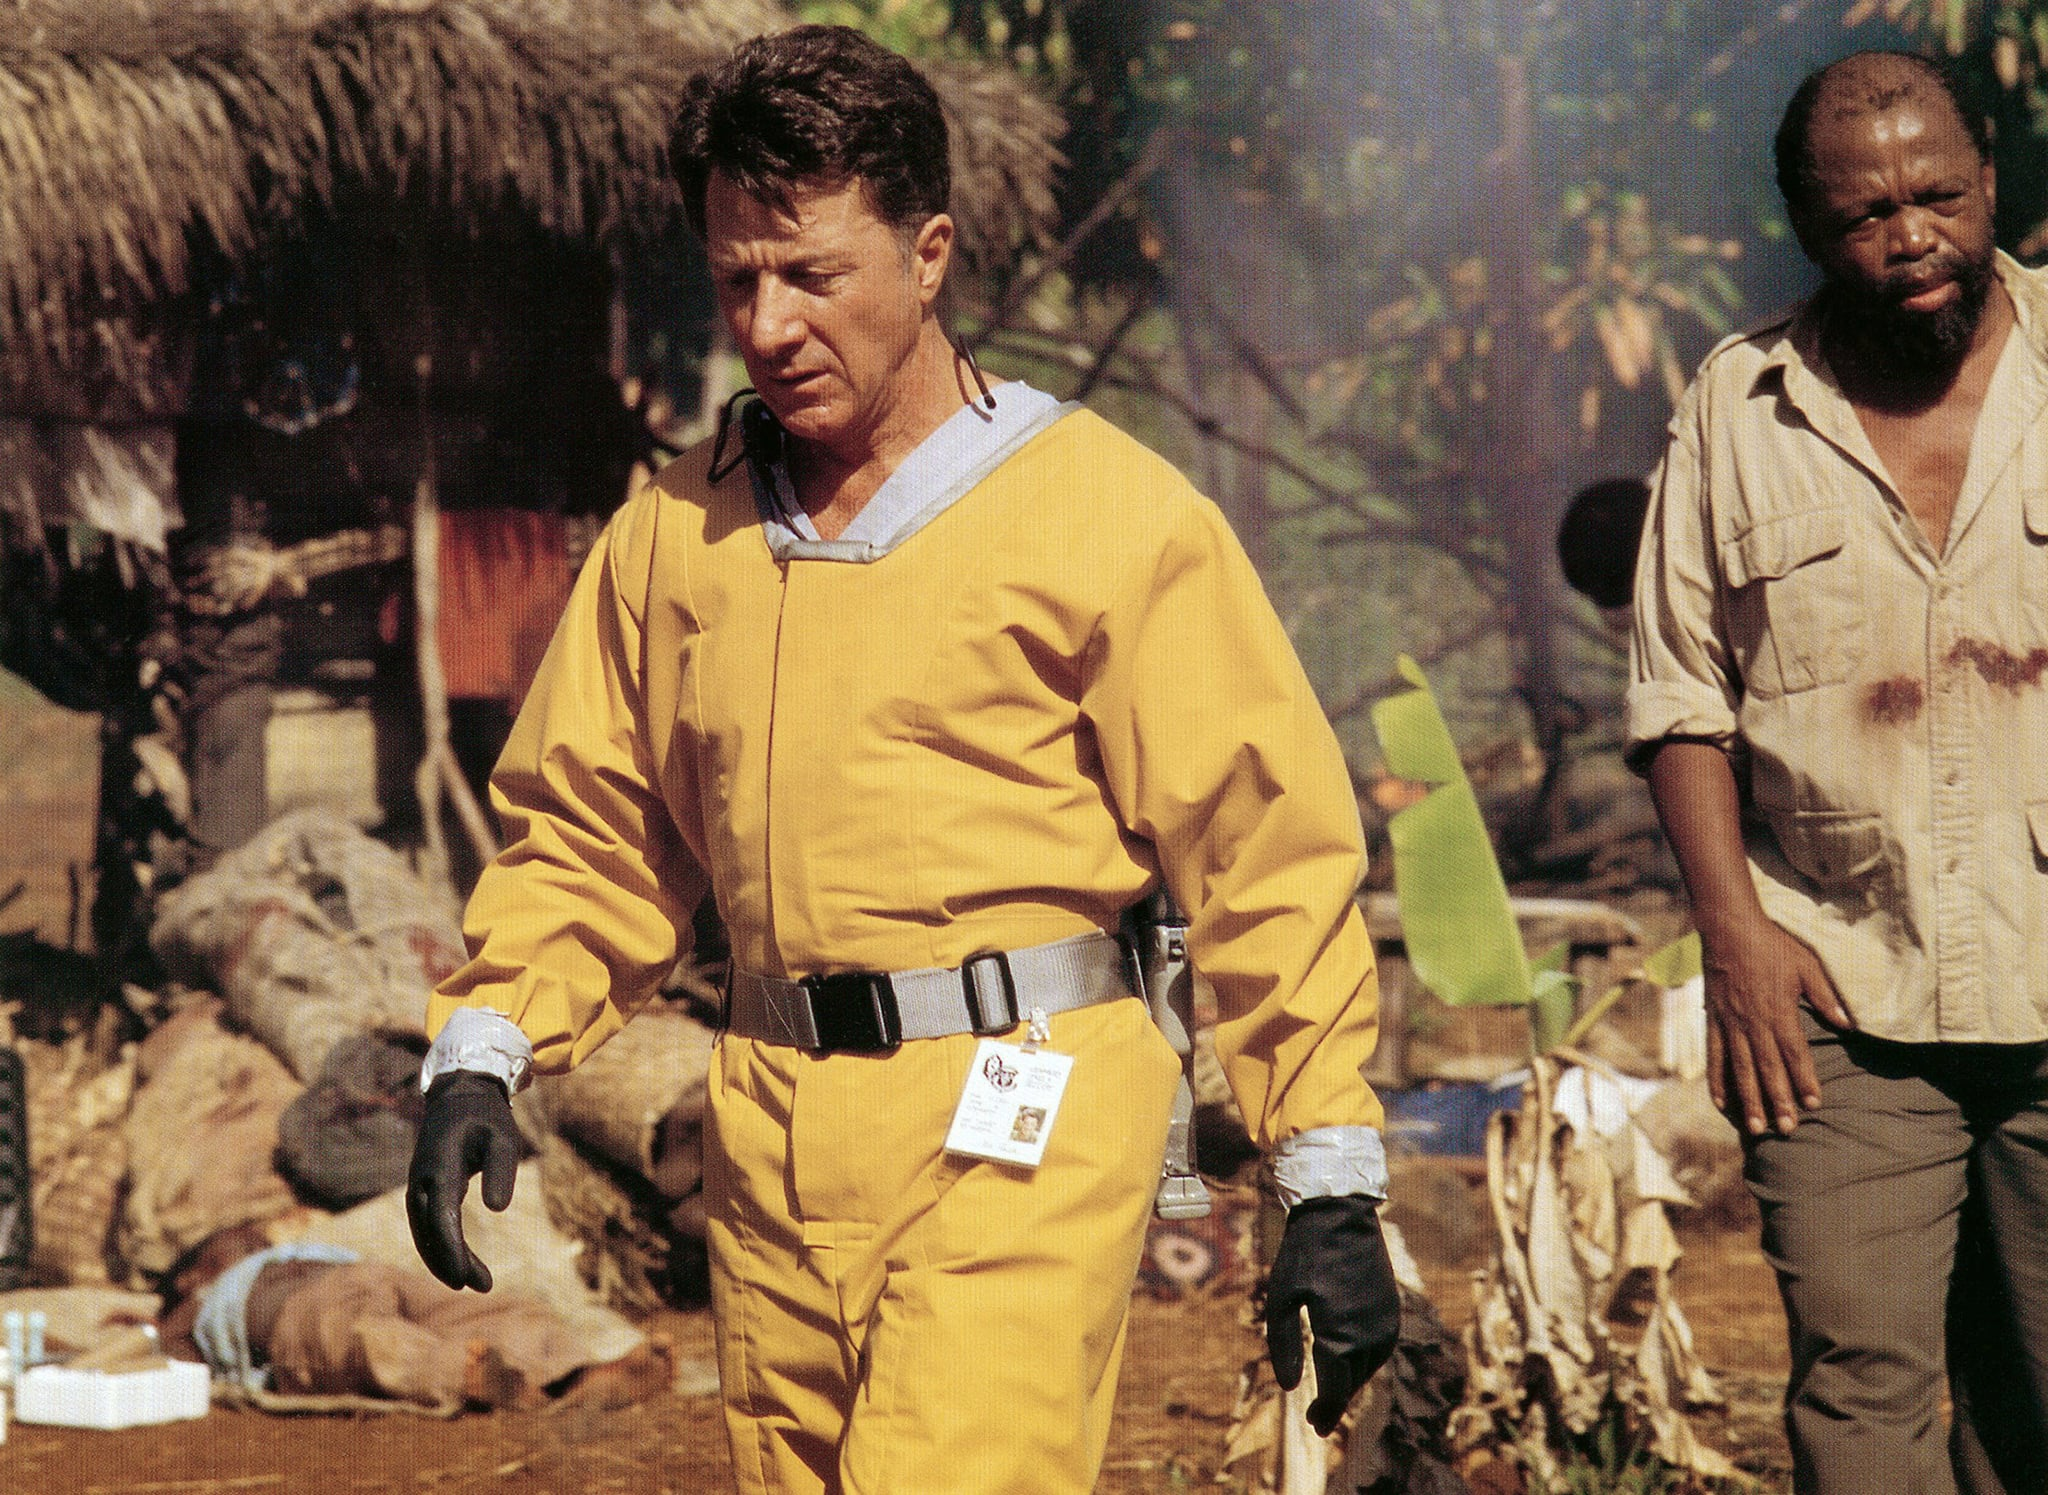 Outbreak 1995 90s Thriller Movies On Netflix Popsugar Entertainment Uk Photo 8